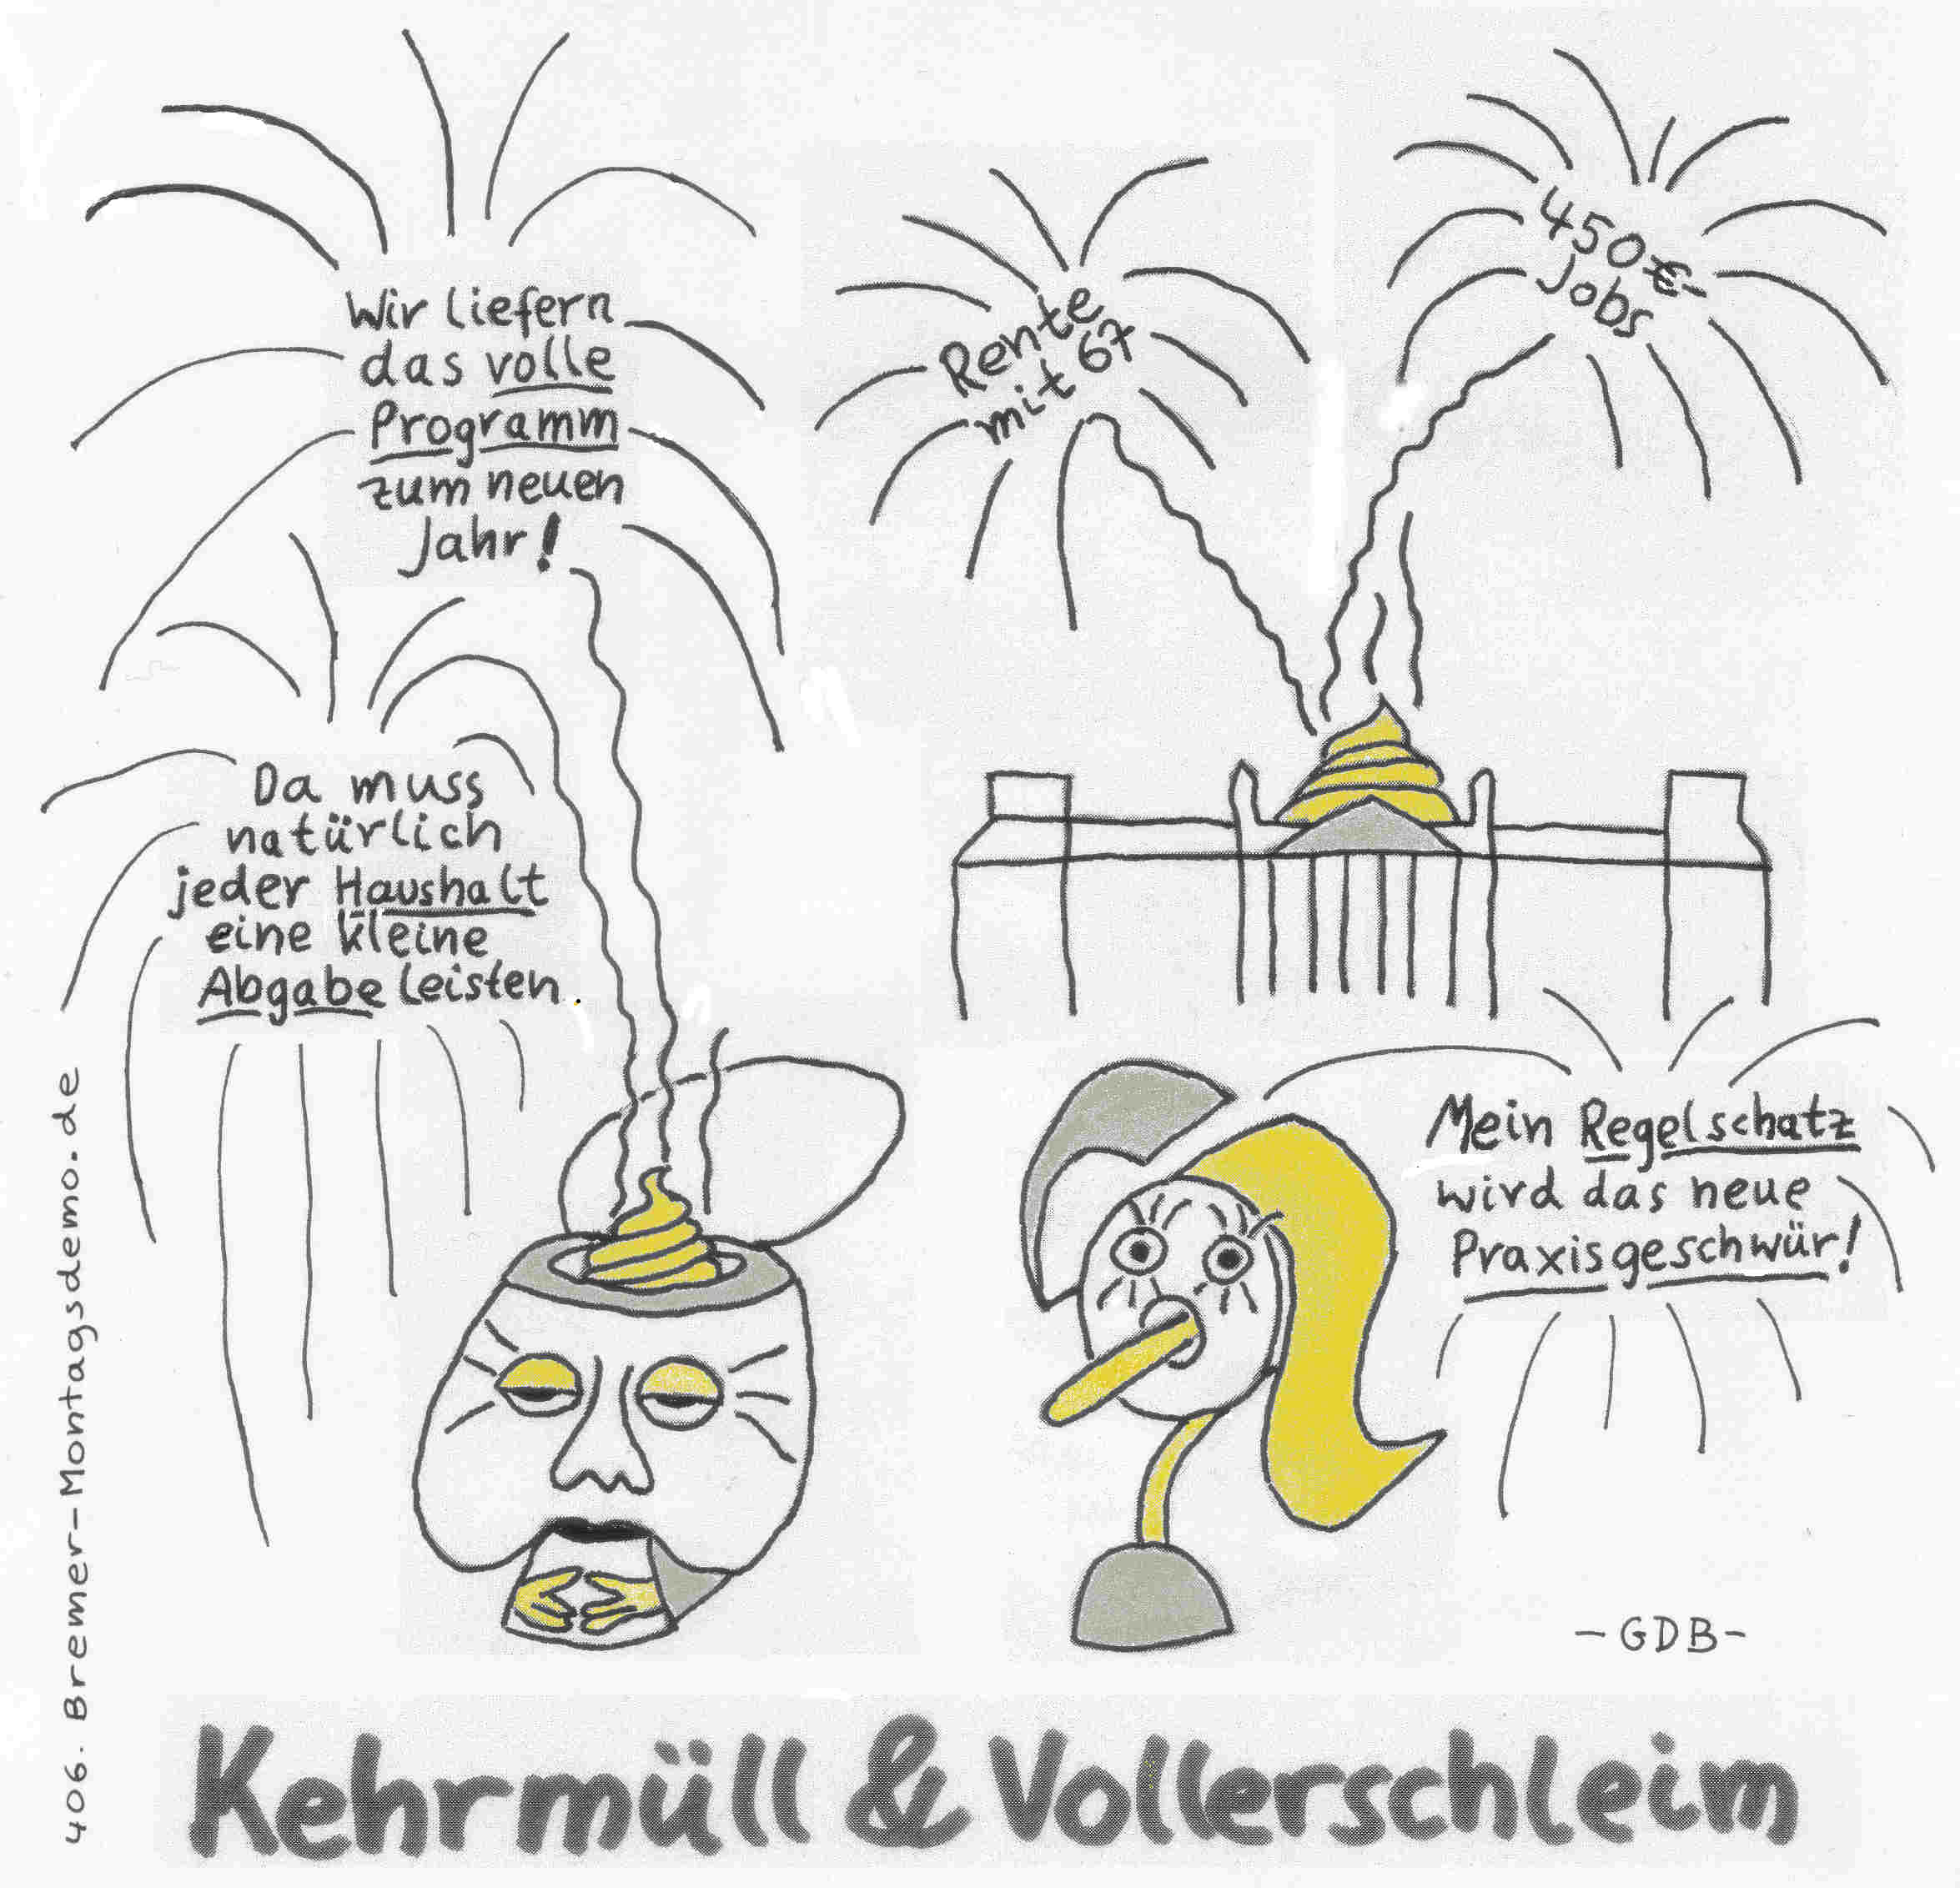 Initiative Bremer Montagsdemo: REDEBUCH 2013